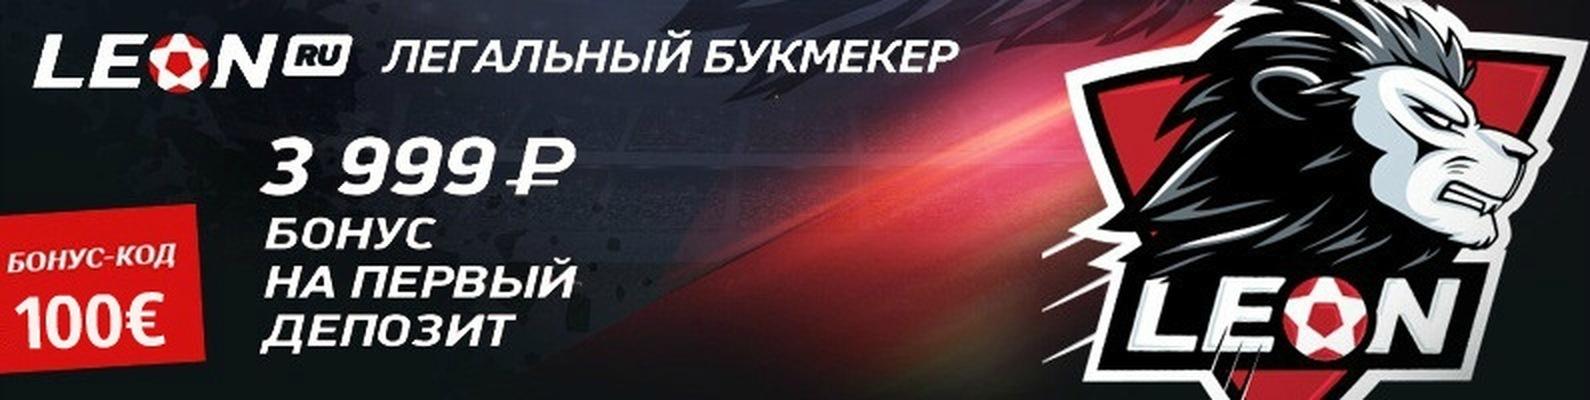 Леон бк зеркало сайта вконтакте